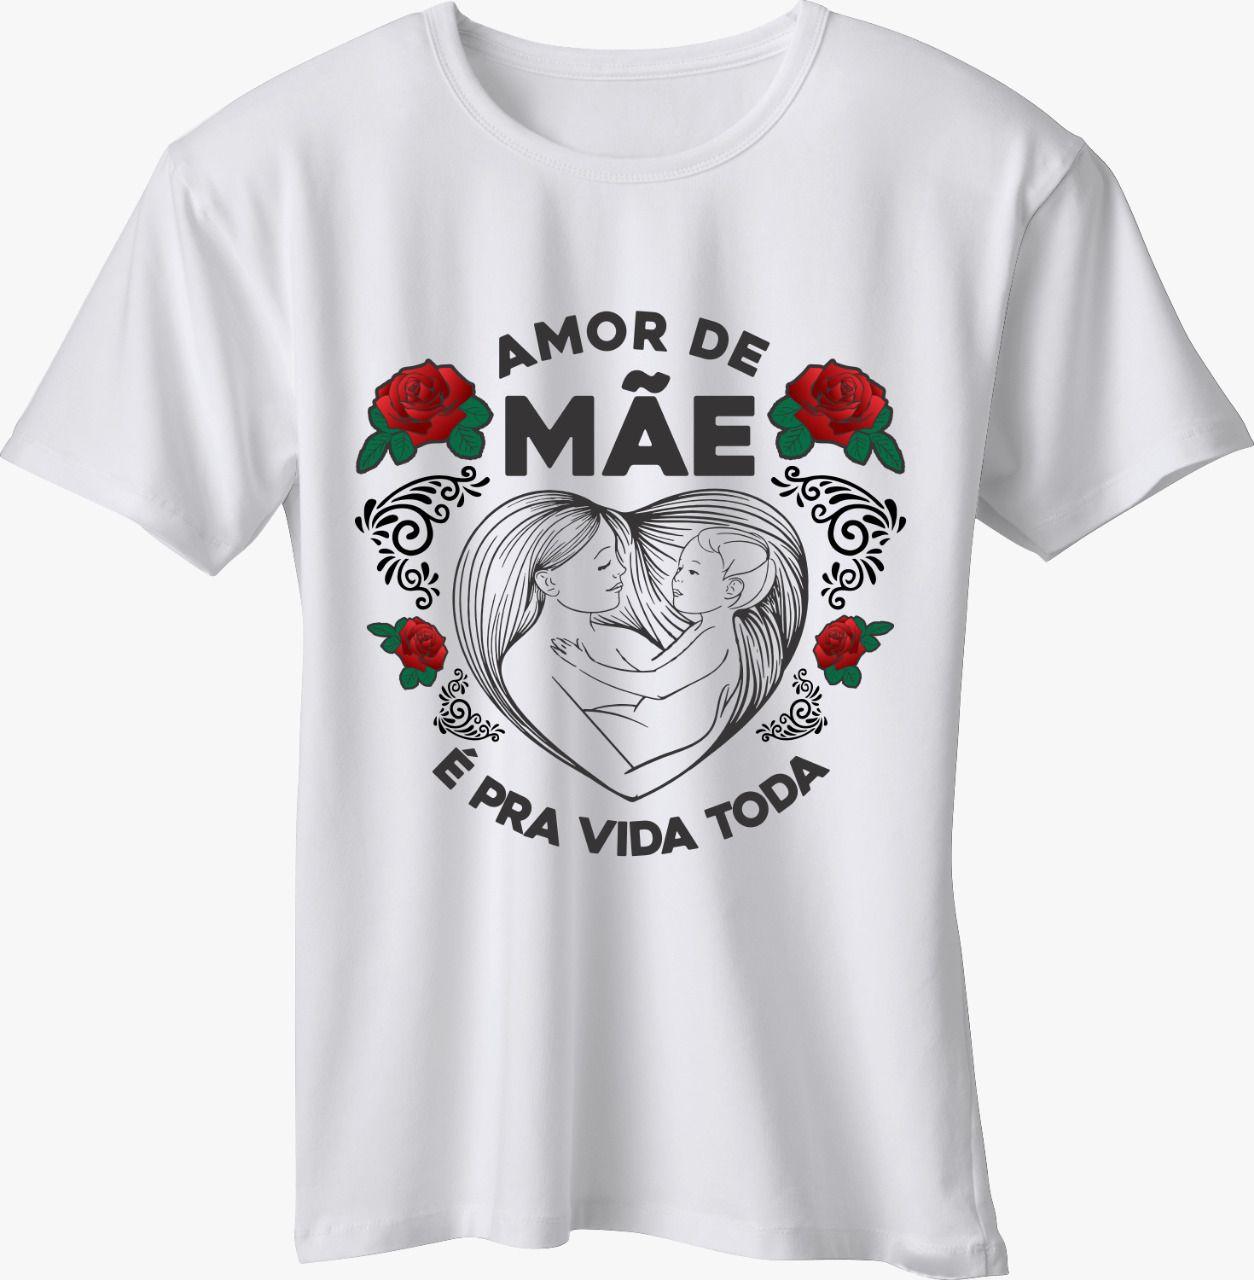 CAMISETA MÃE - AMOR DE MÃE